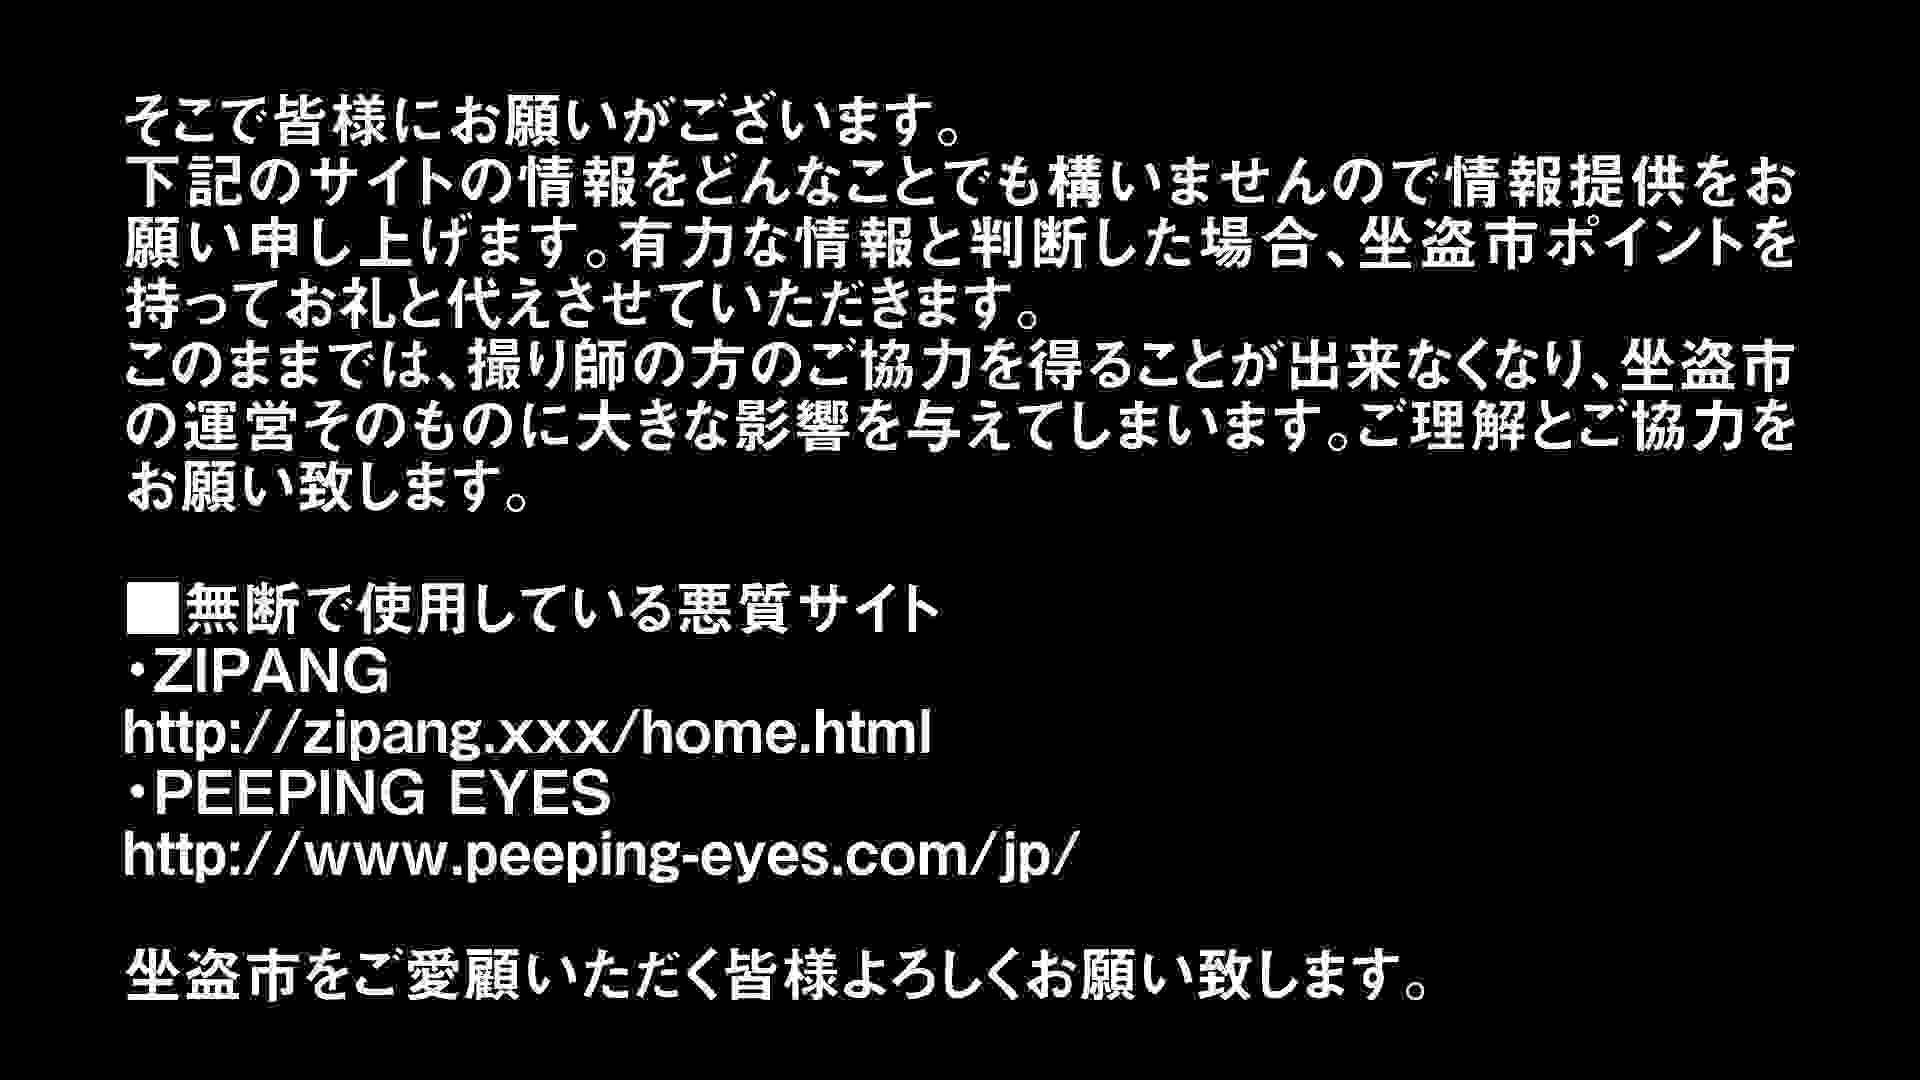 Aquaな露天風呂Vol.304 0 | 0  65連発 1